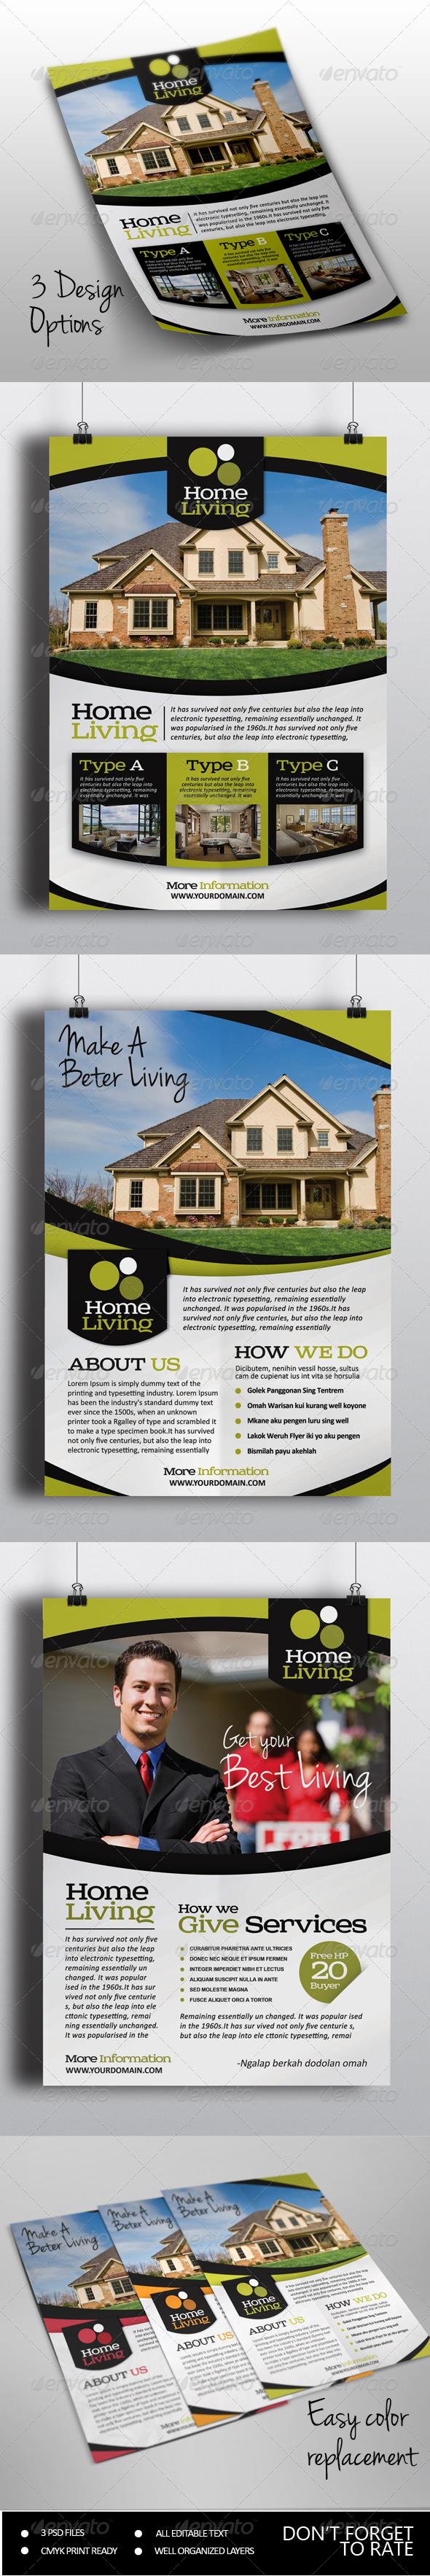 Living Real Estate Flyer - Commerce Flyers